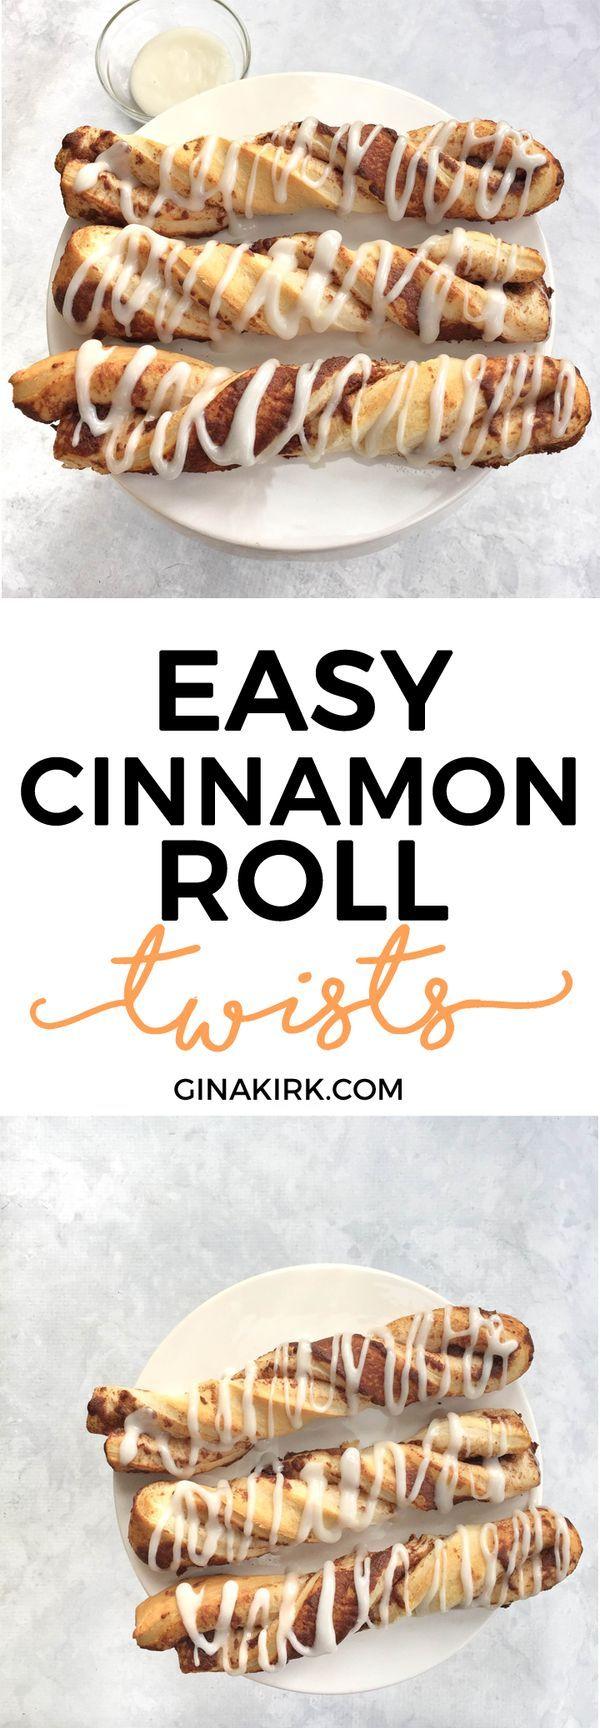 Easy cinnamon roll twists | Canned cinnamon roll breakfast ideas | Cinnamon roll bread sticks | Breakfast cinnamon sticks | GinaKirk.com @ginaekirk